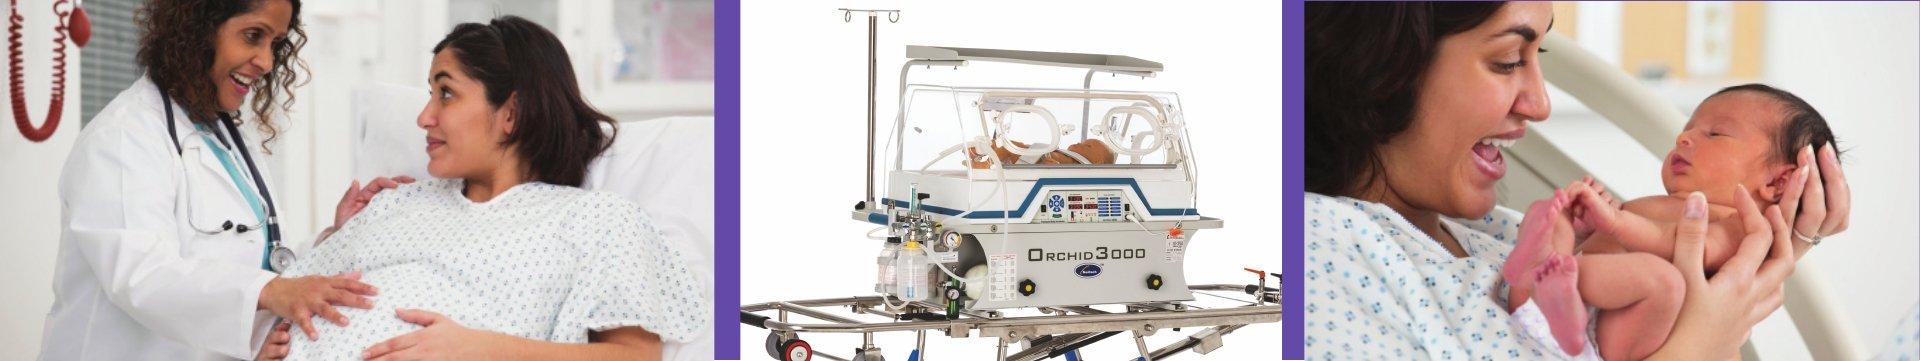 Infant Equipment Manufacturers